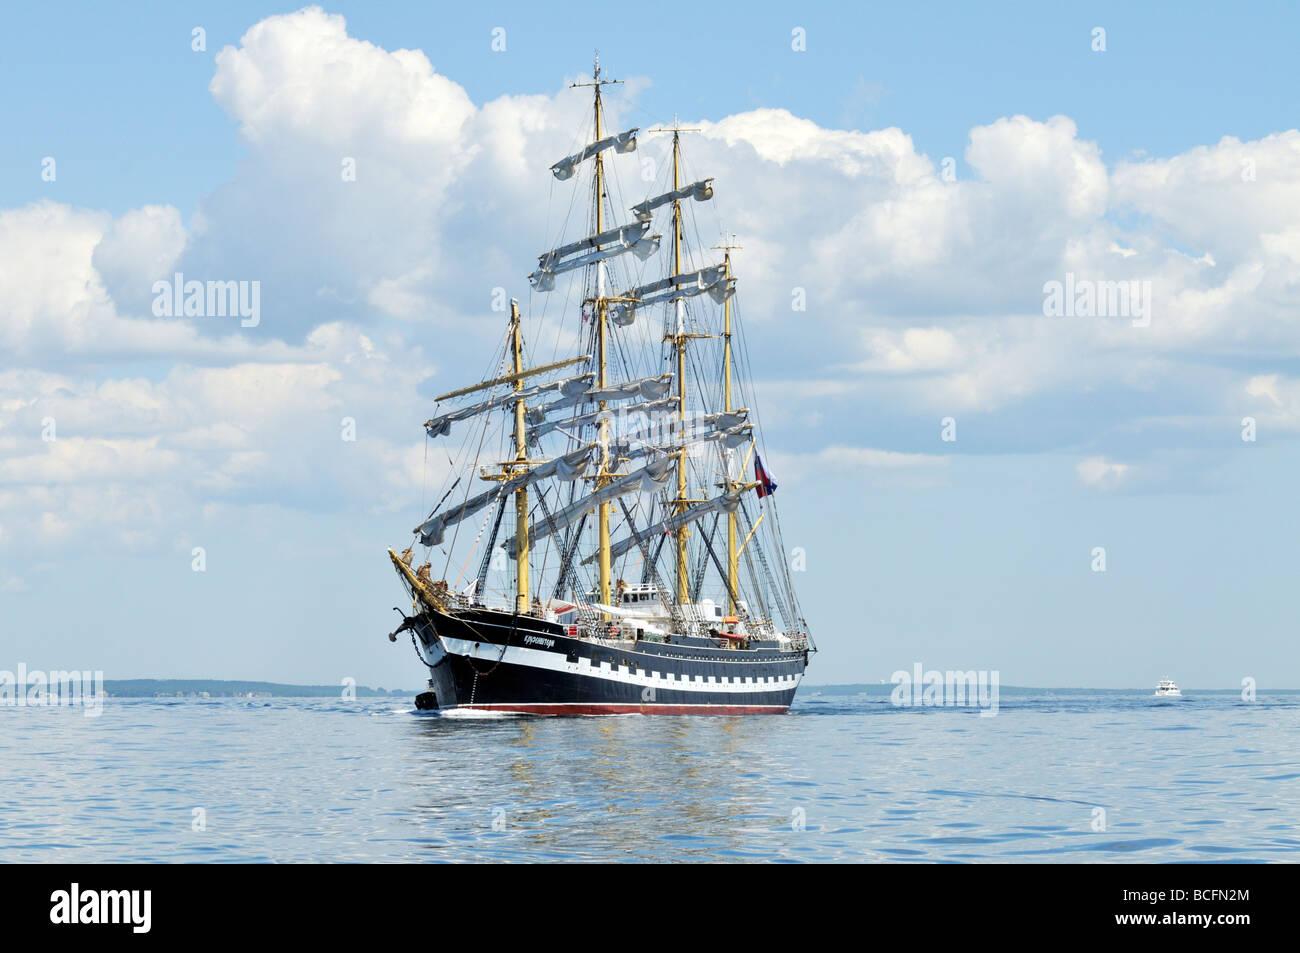 Russian Tall Ship Kruzenshtern a four masted barque in Buzzards Bay Cape Cod - Stock Image